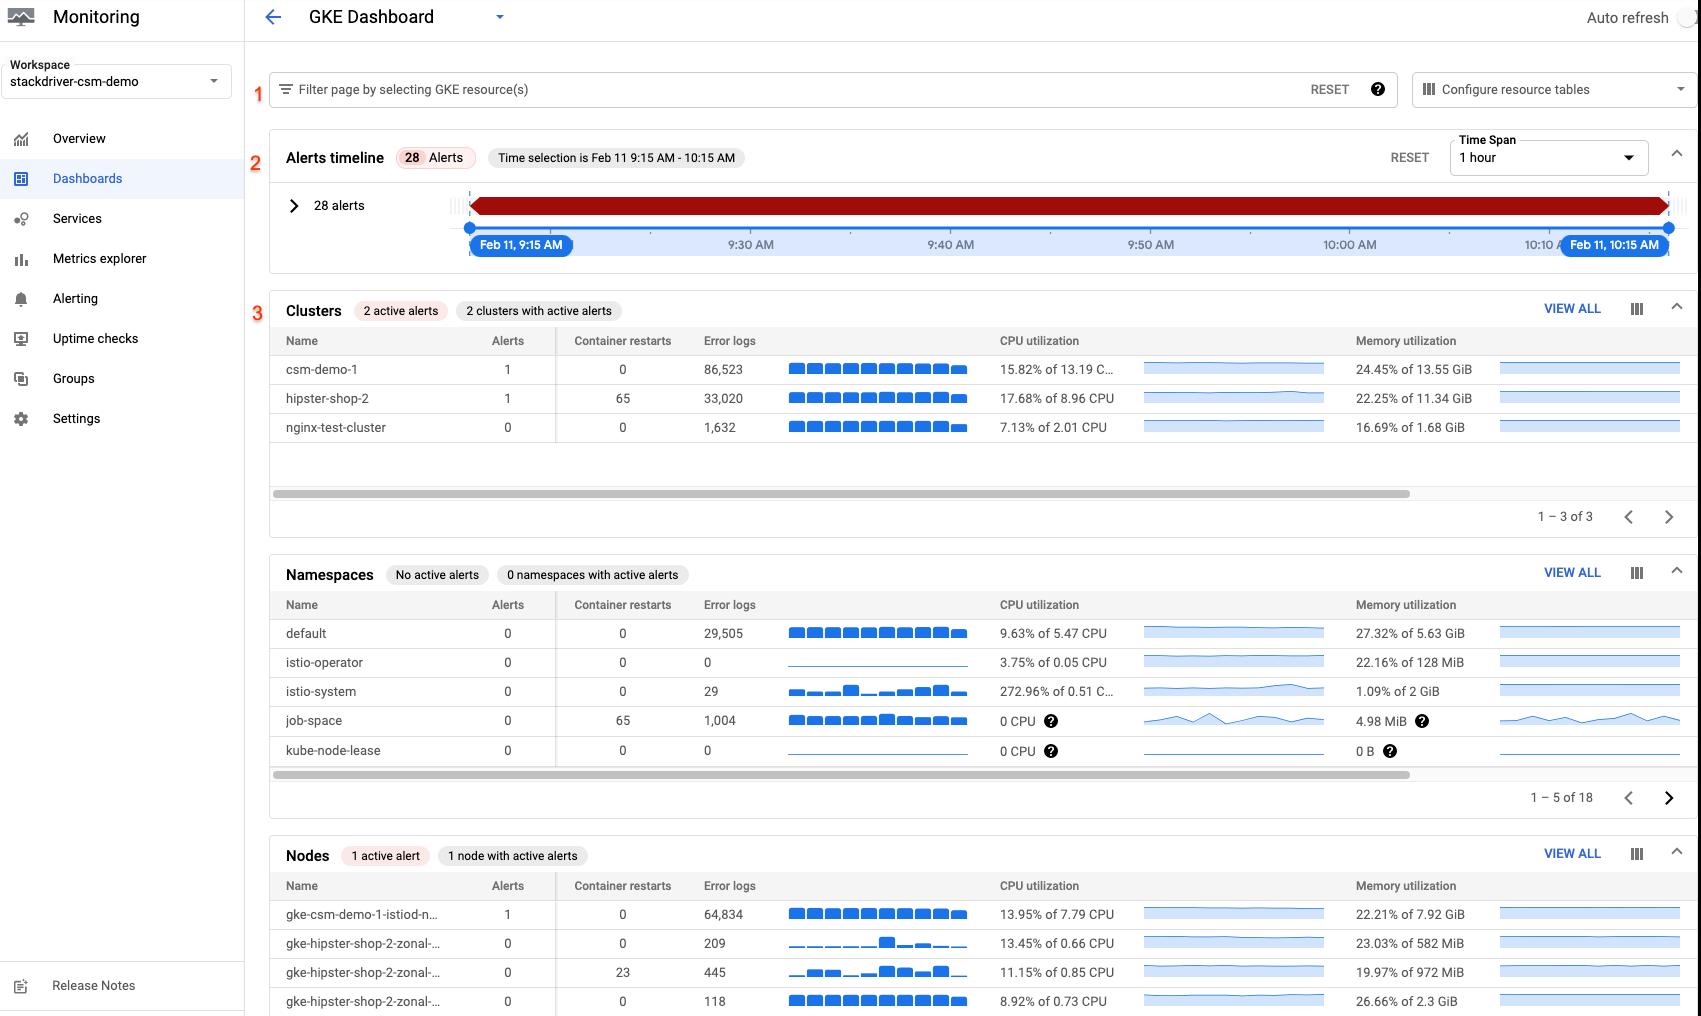 Cloud Operations for GKE 대시보드의 테이블 형식의 뷰를 표시합니다.